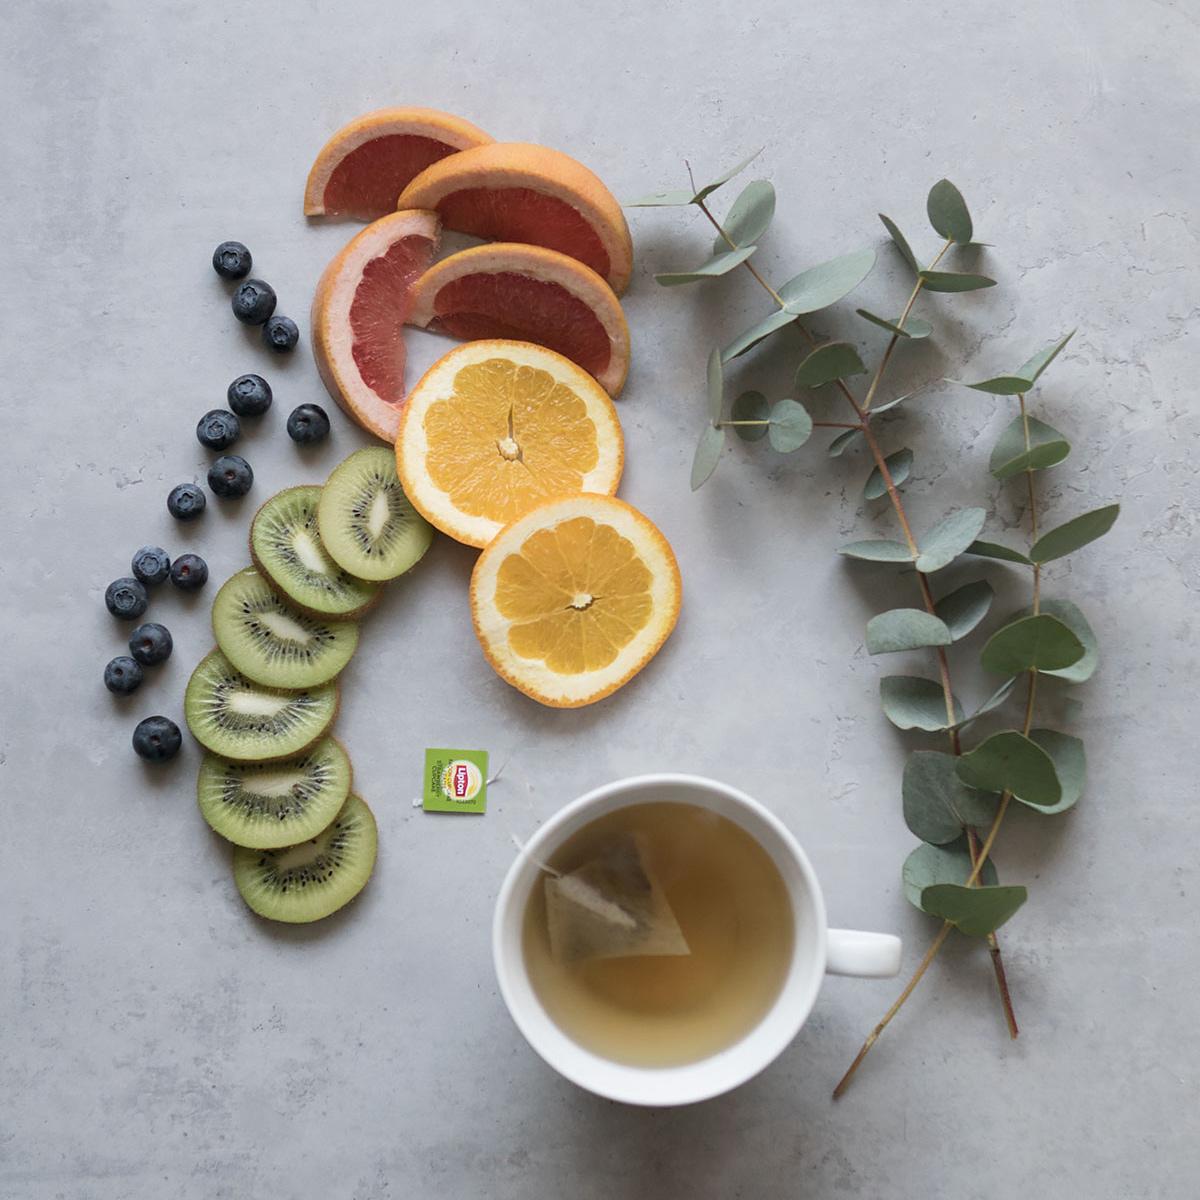 Te och frukt